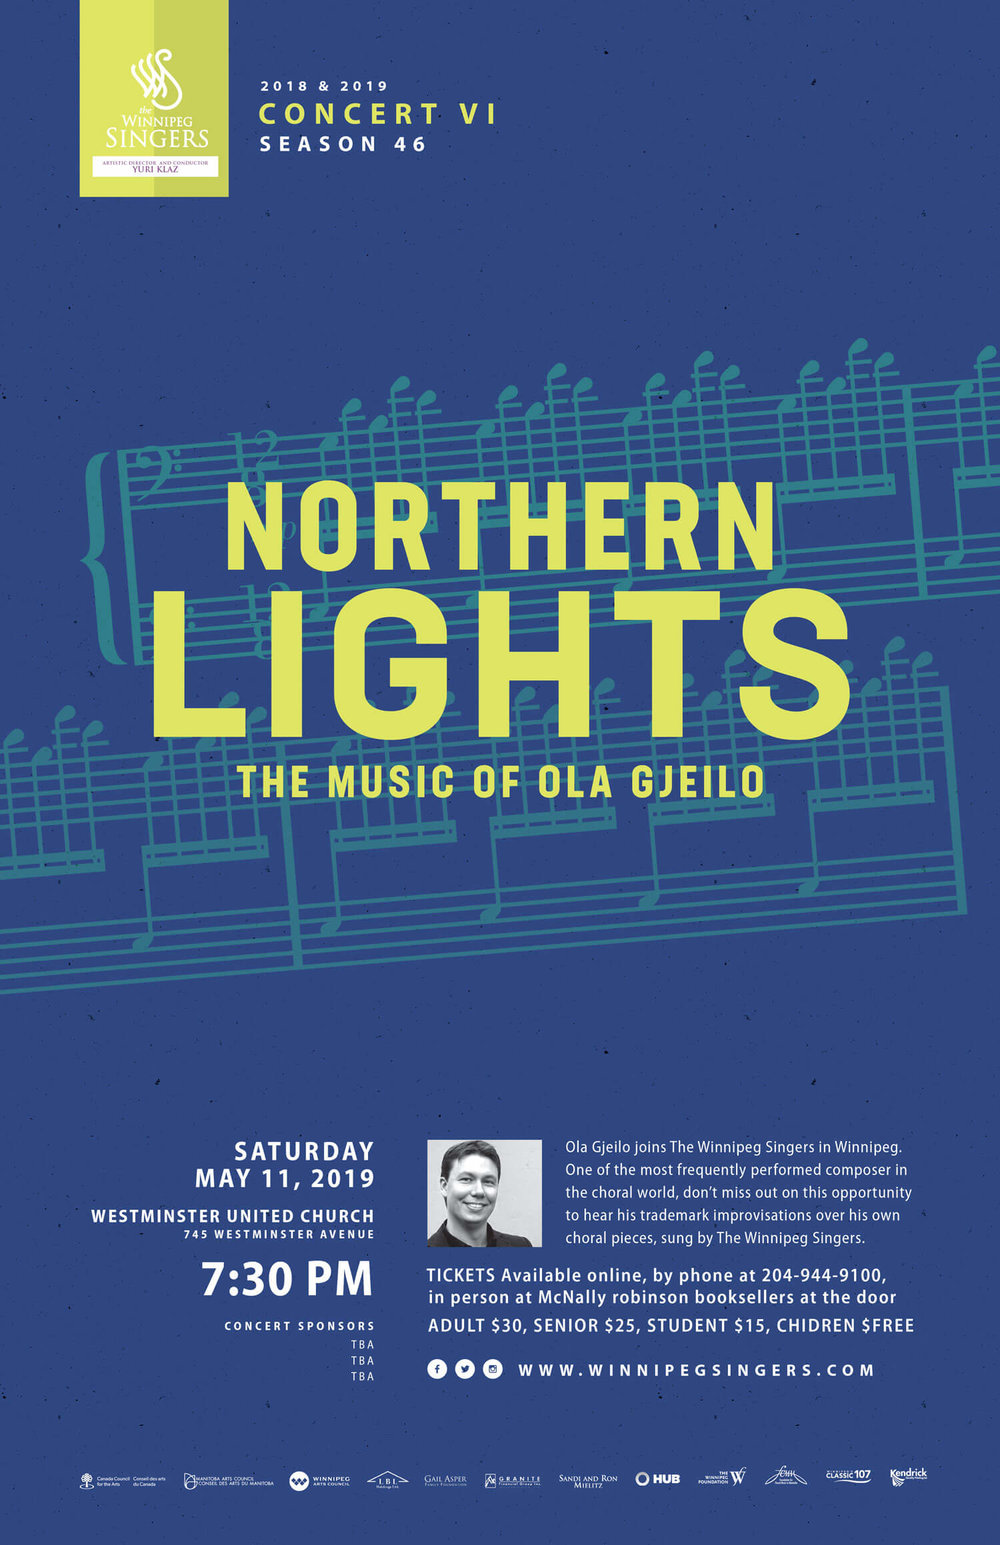 Winnipeg Singers - Northern Lights Concert